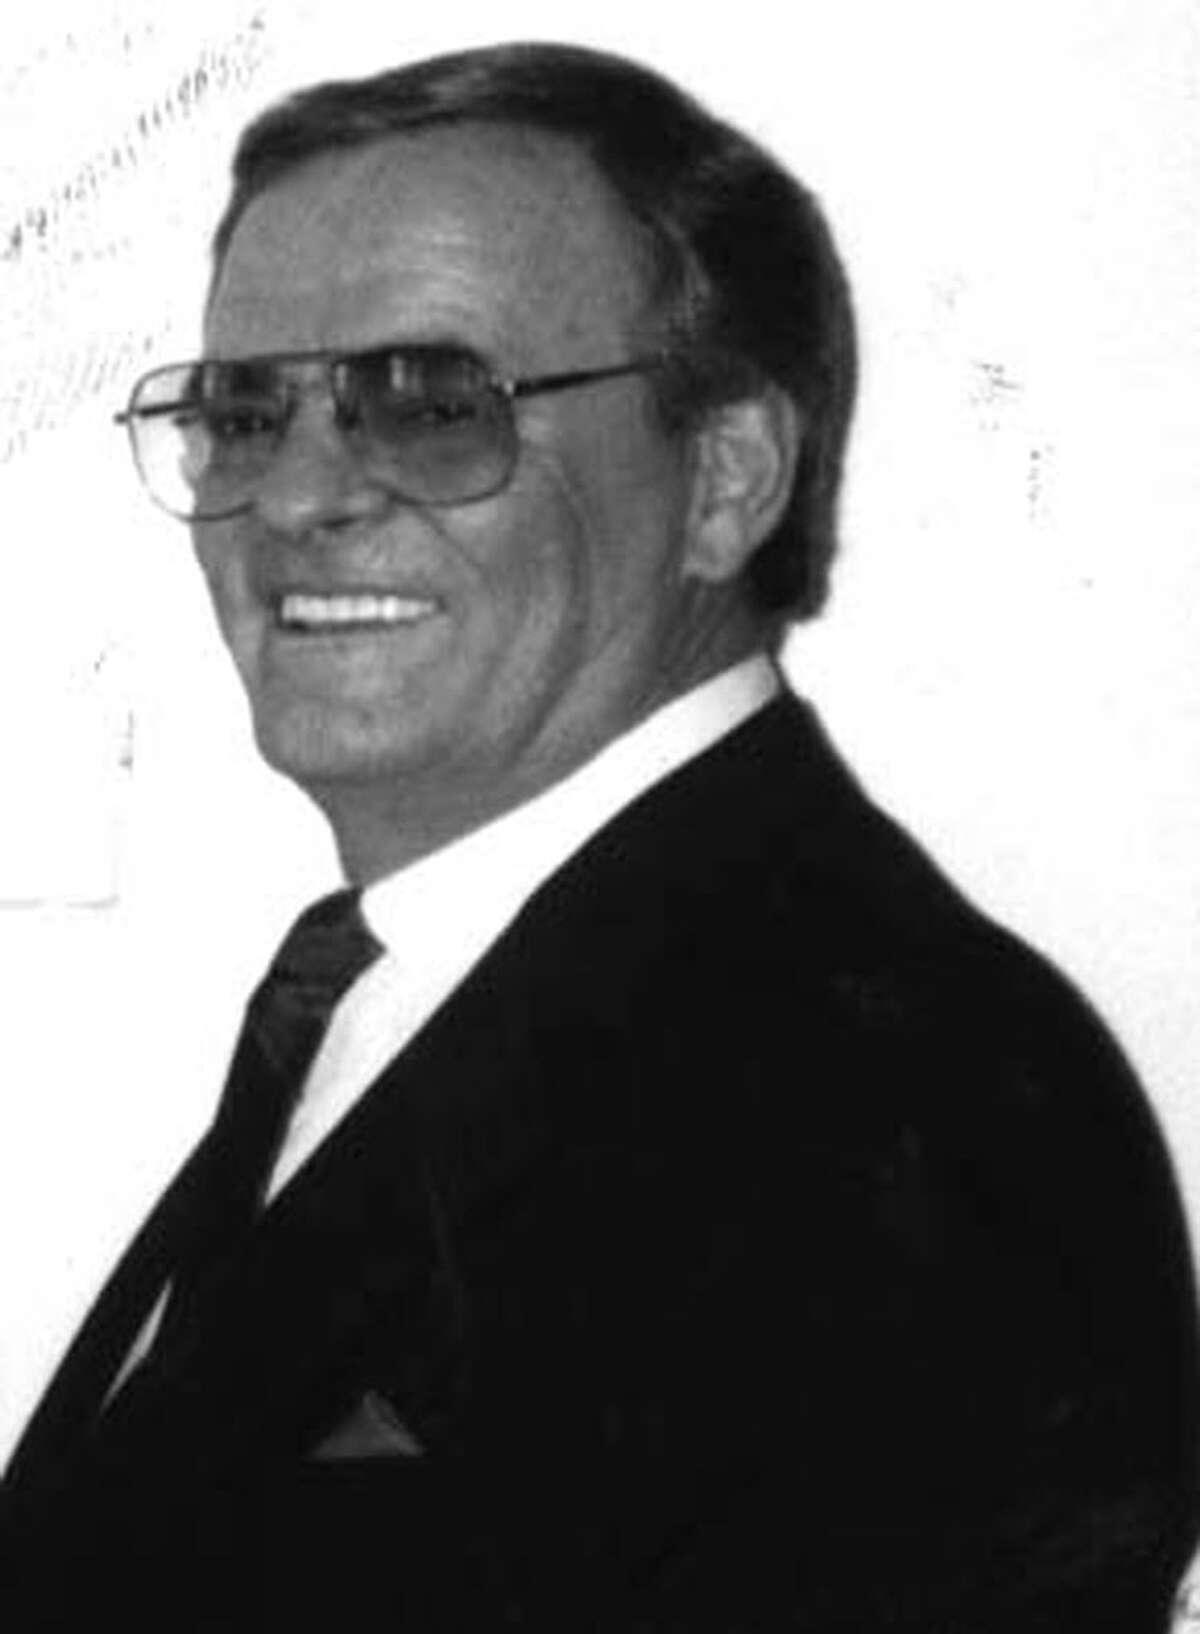 John Hedley. 3/20/1990. -1- McBride.